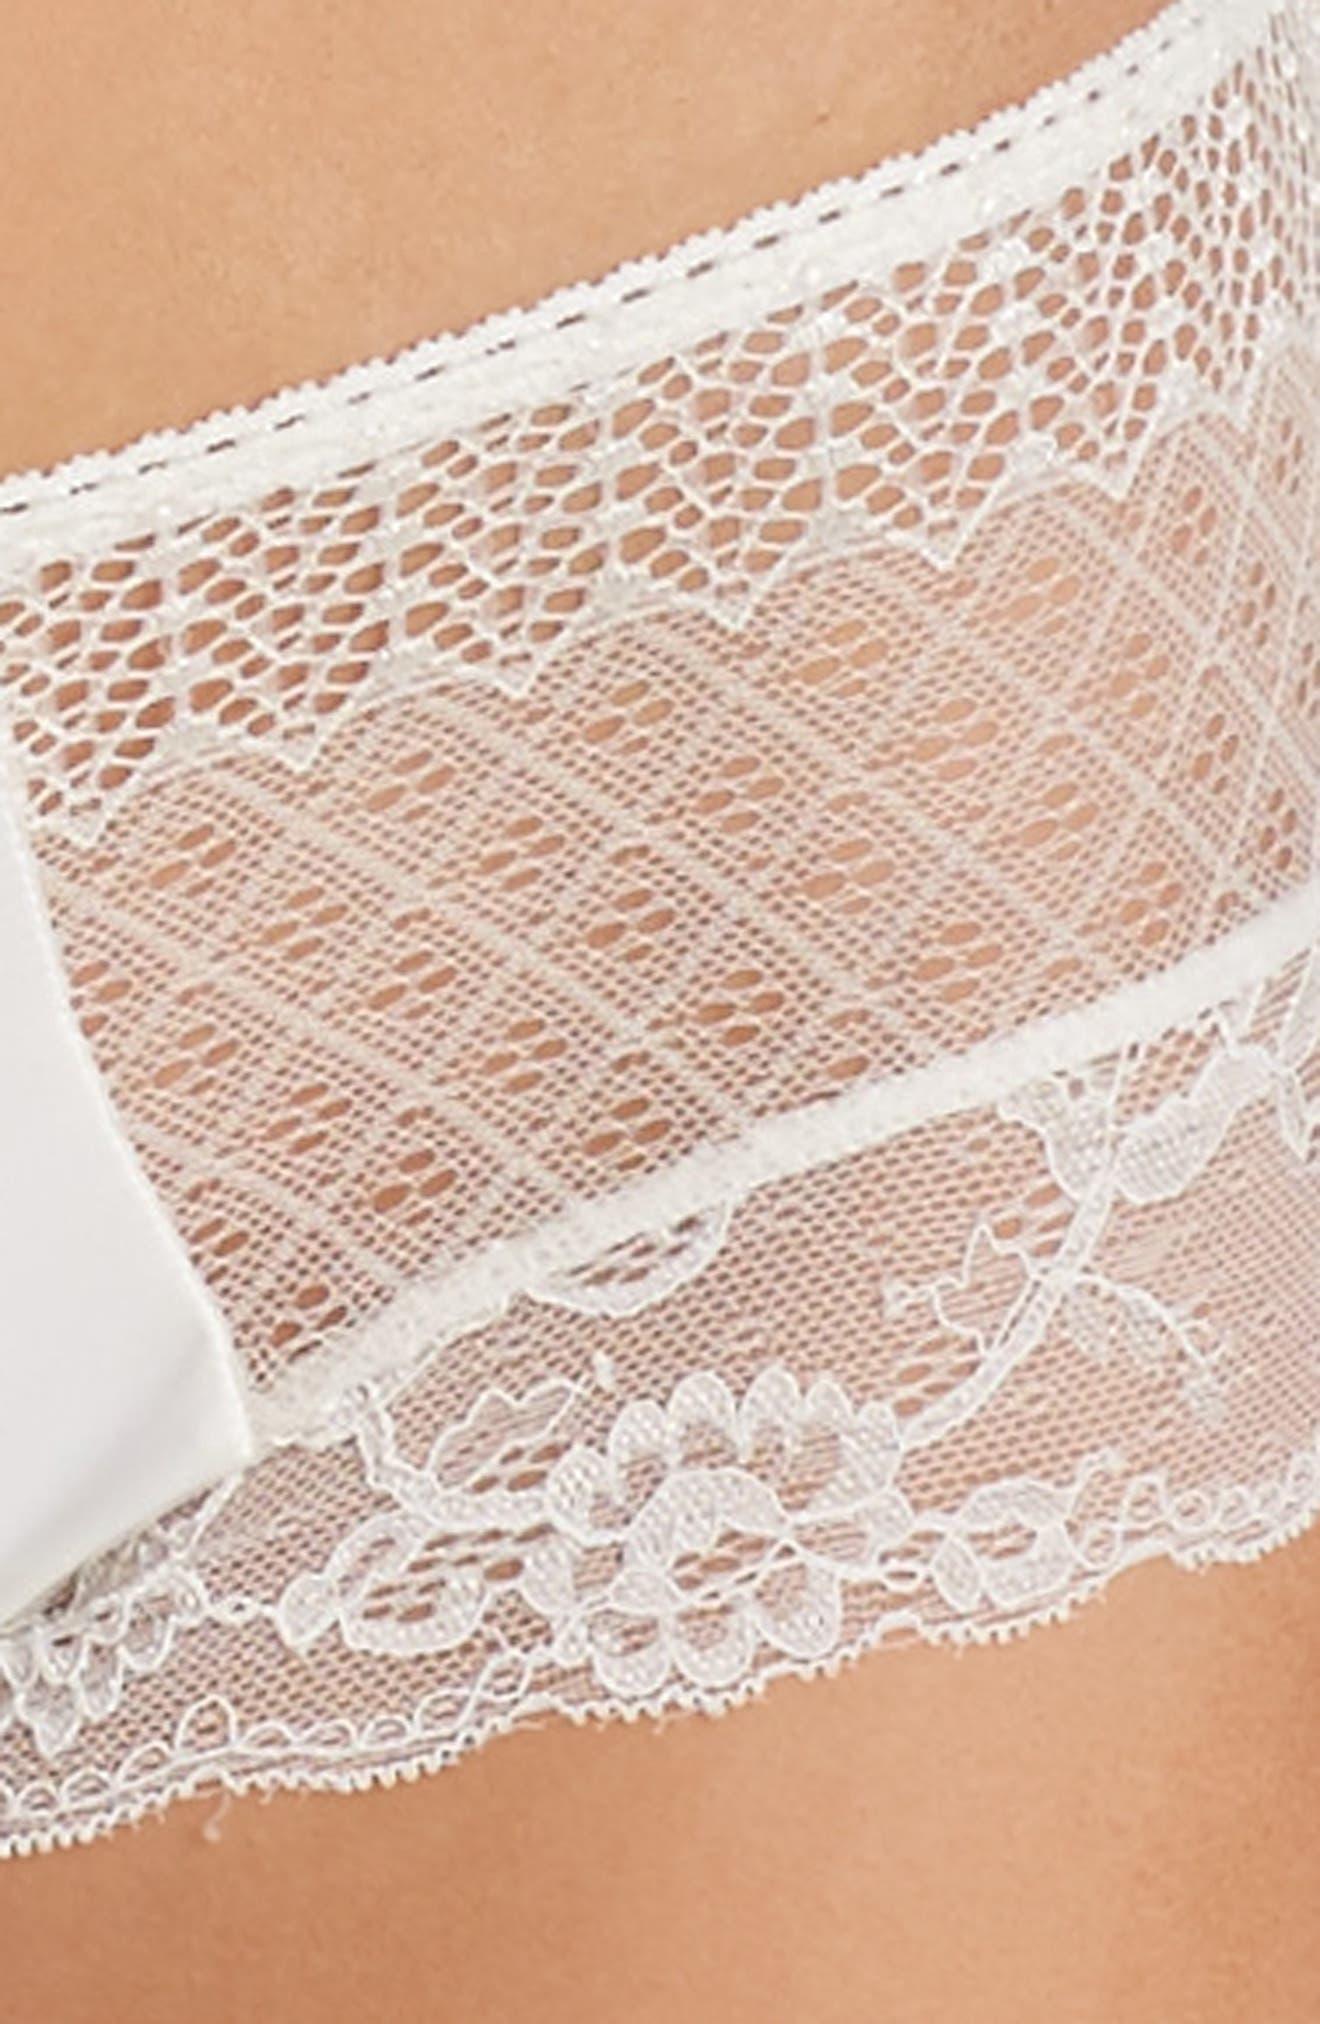 Honeydew Microfiber & Lace Hipster Panties,                             Alternate thumbnail 12, color,